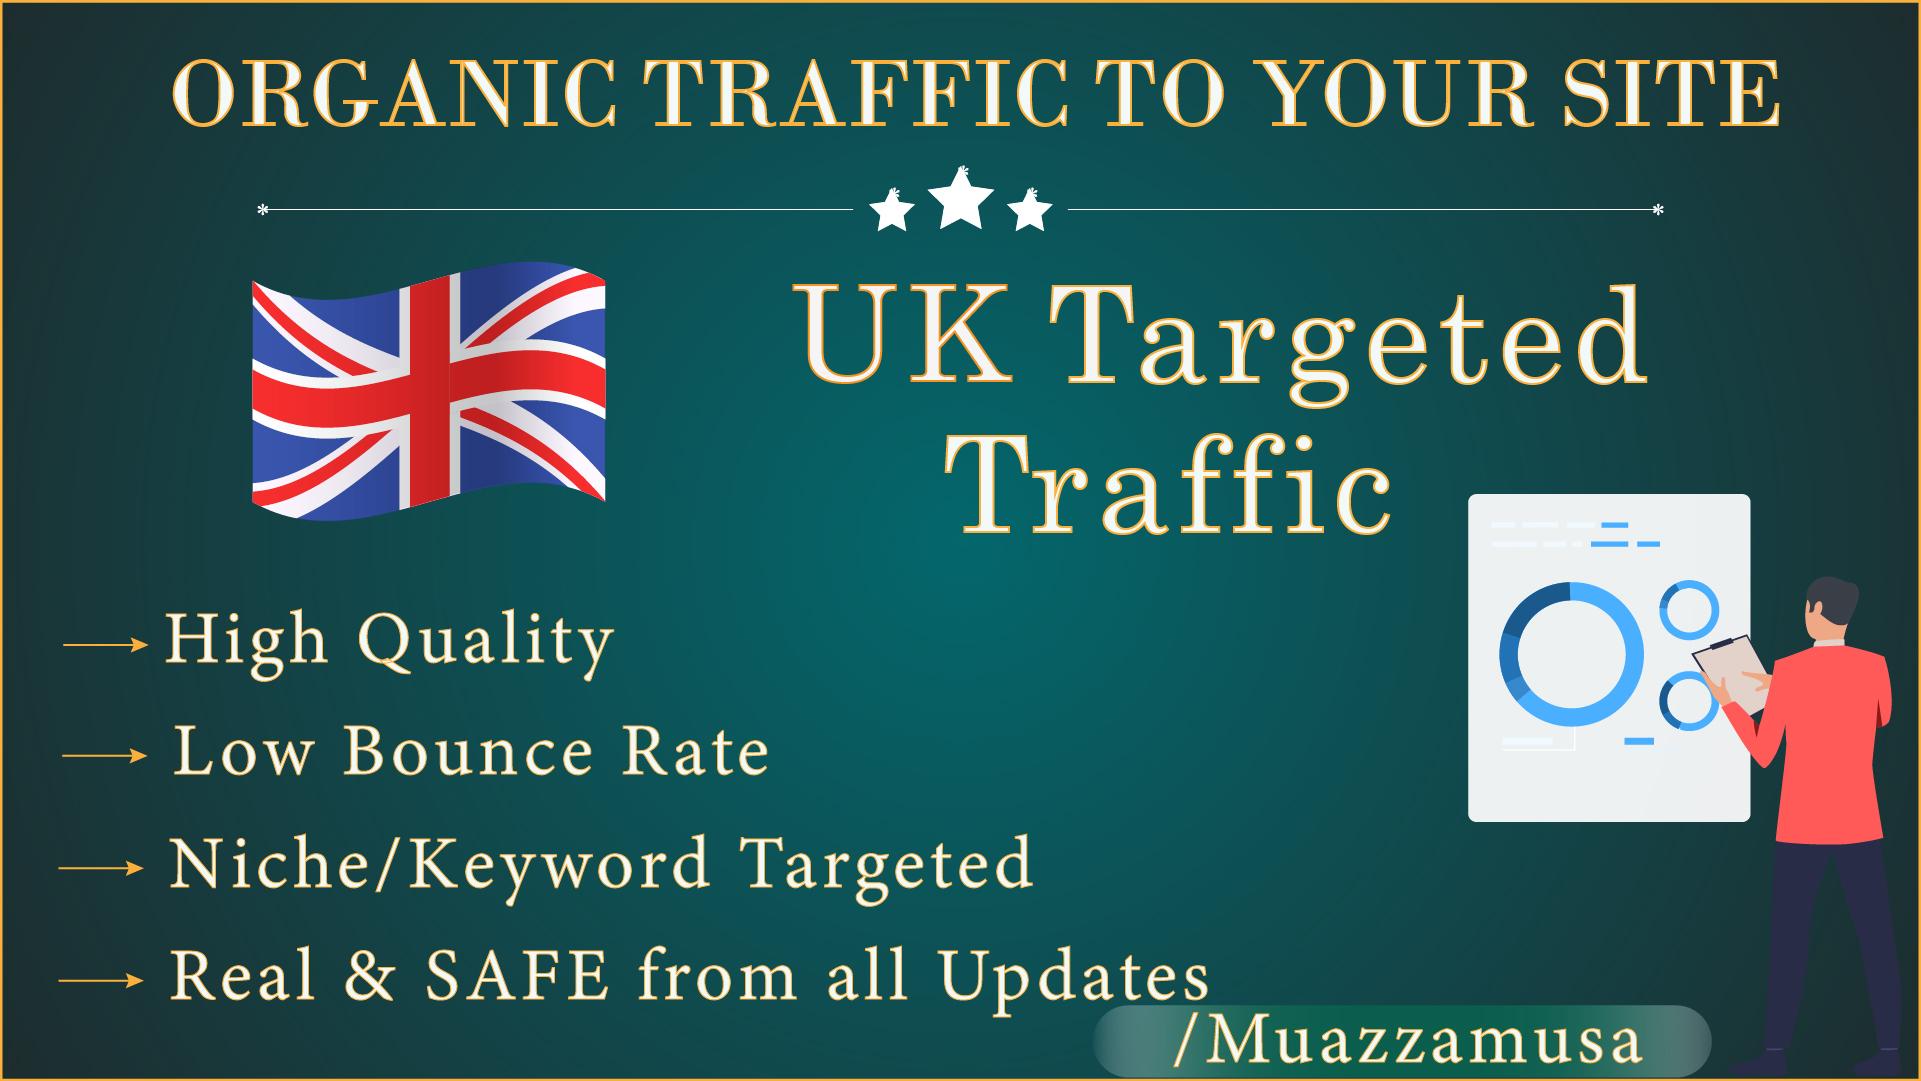 UK Google Keyword Targeted Traffic for 30 Days